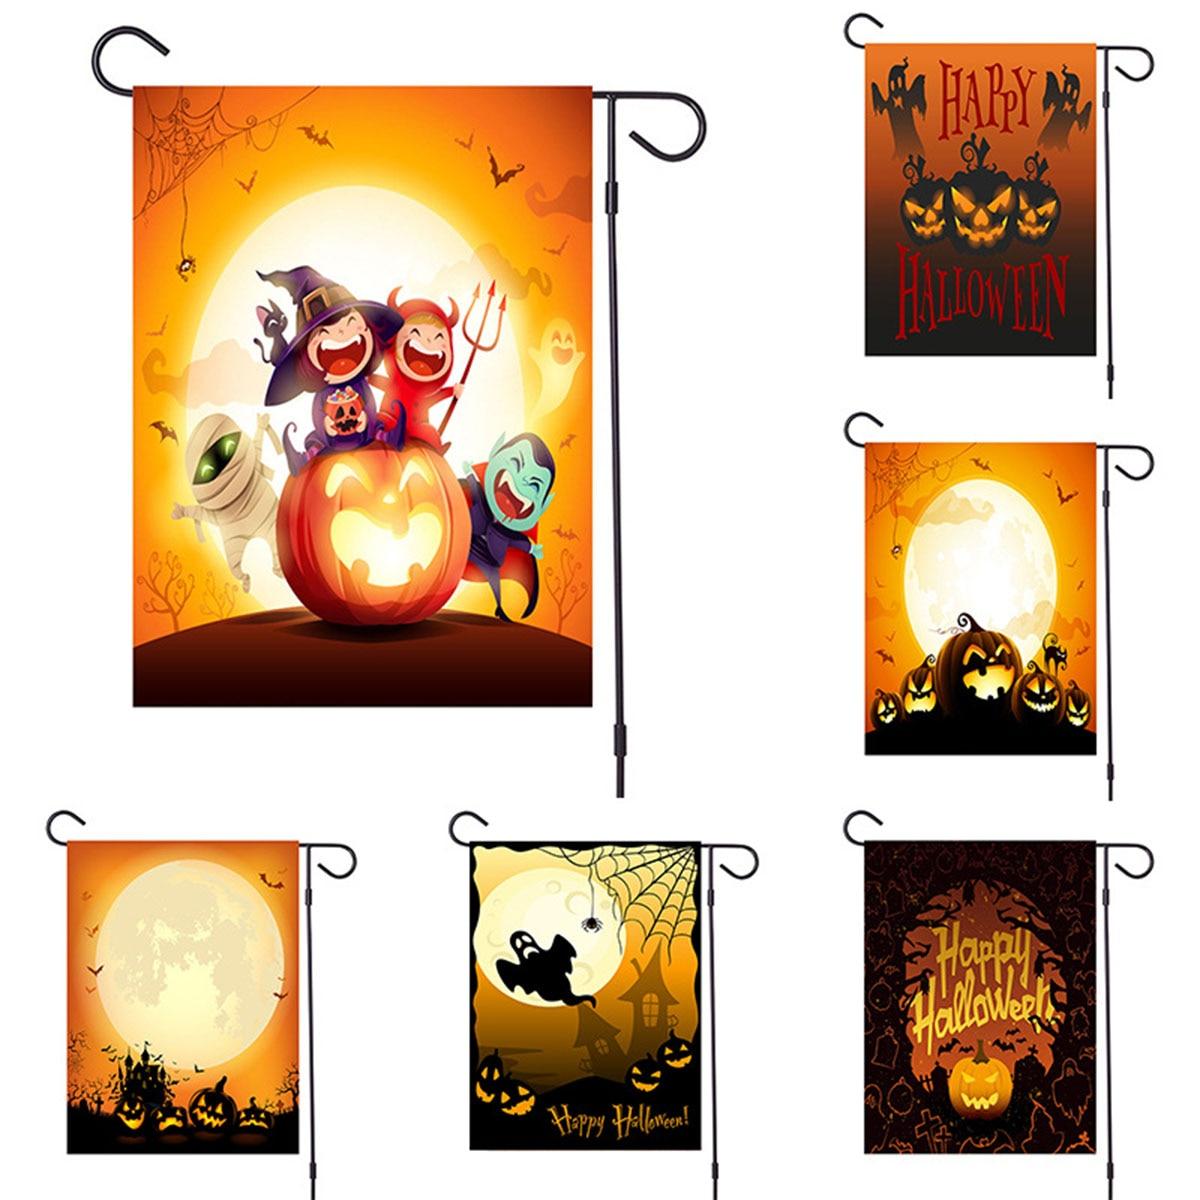 Calabaza Halloween jardín bandera impermeable doble cara arpillera Banner patrón decoración al aire libre césped decoración del hogar